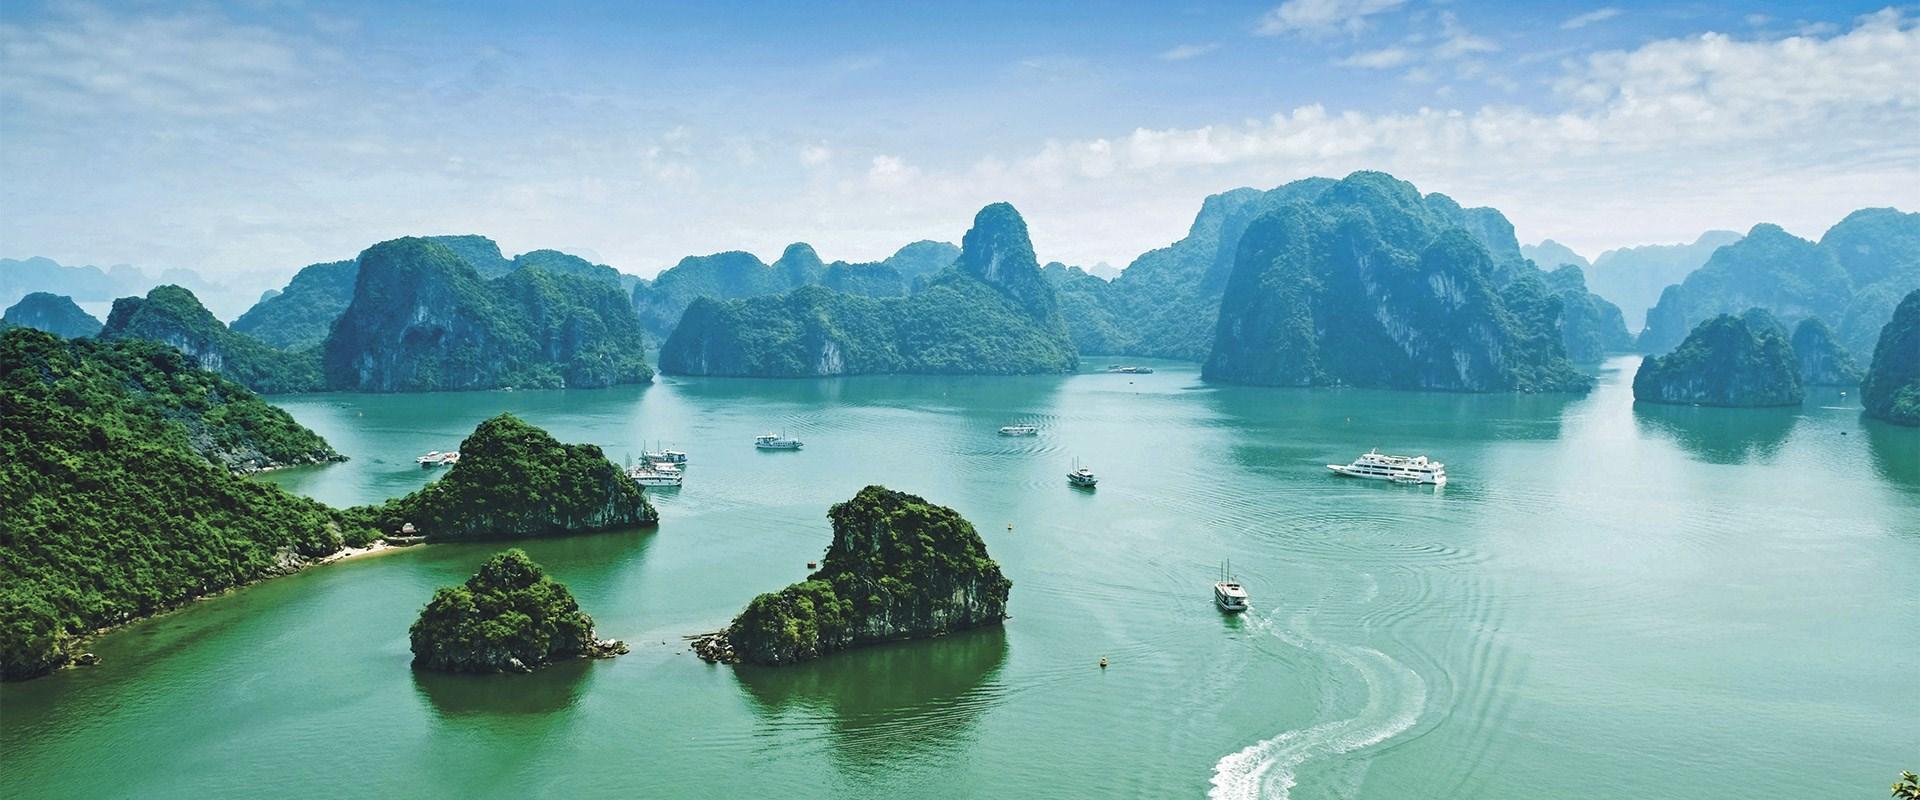 Mekong River Scenery Banner